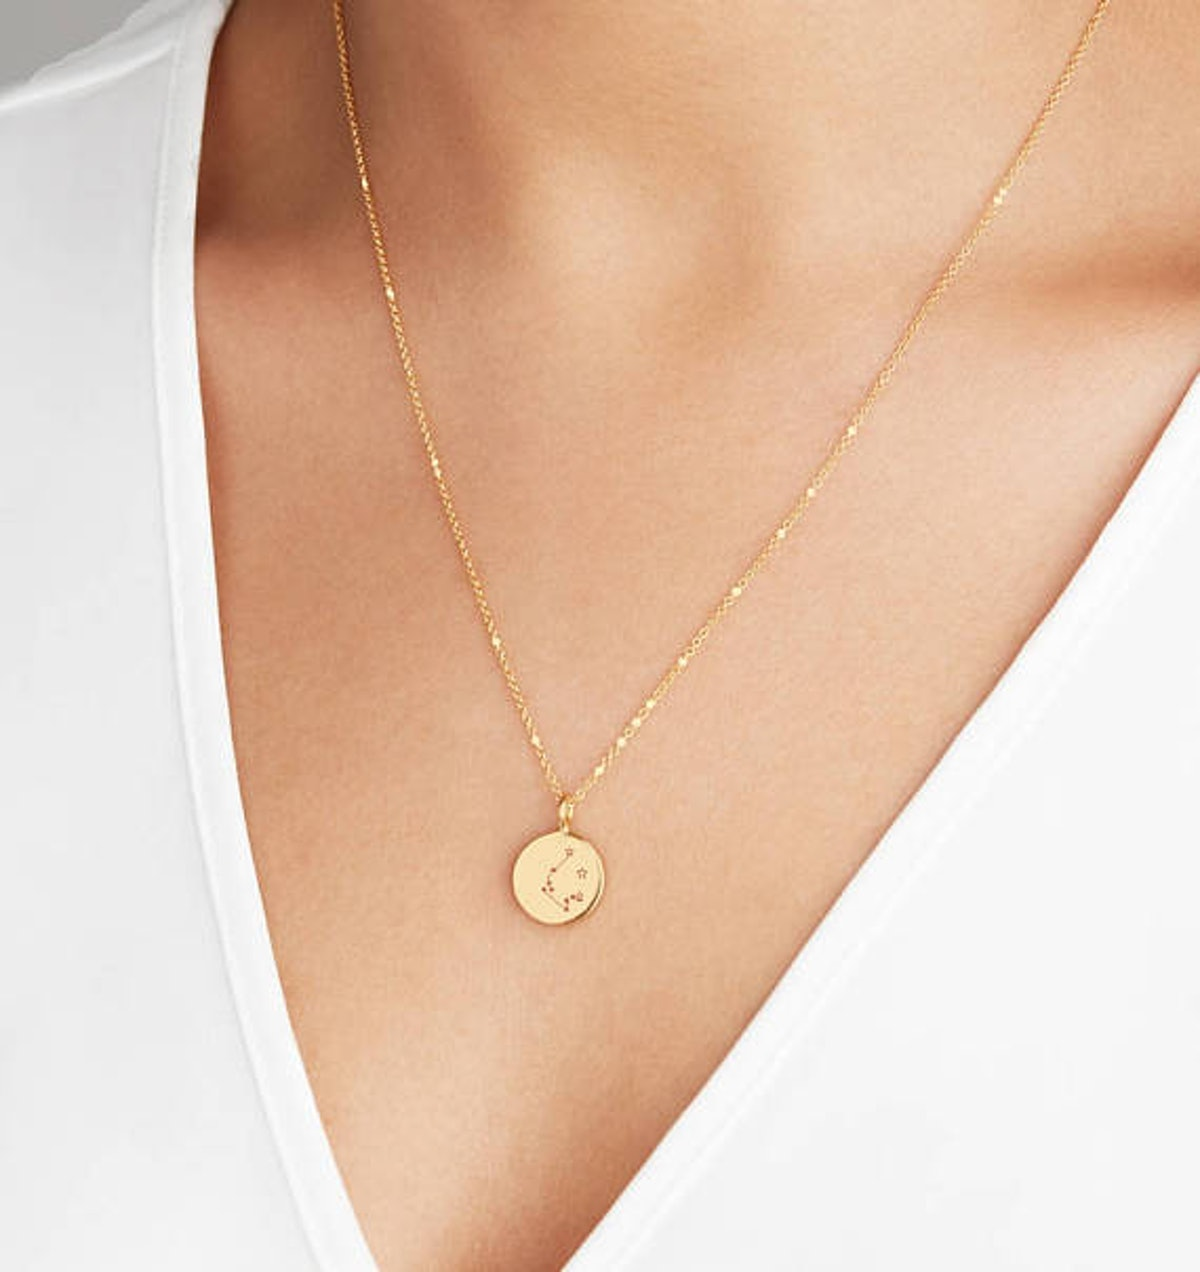 DarlingJewelryStudio Constellation Necklace